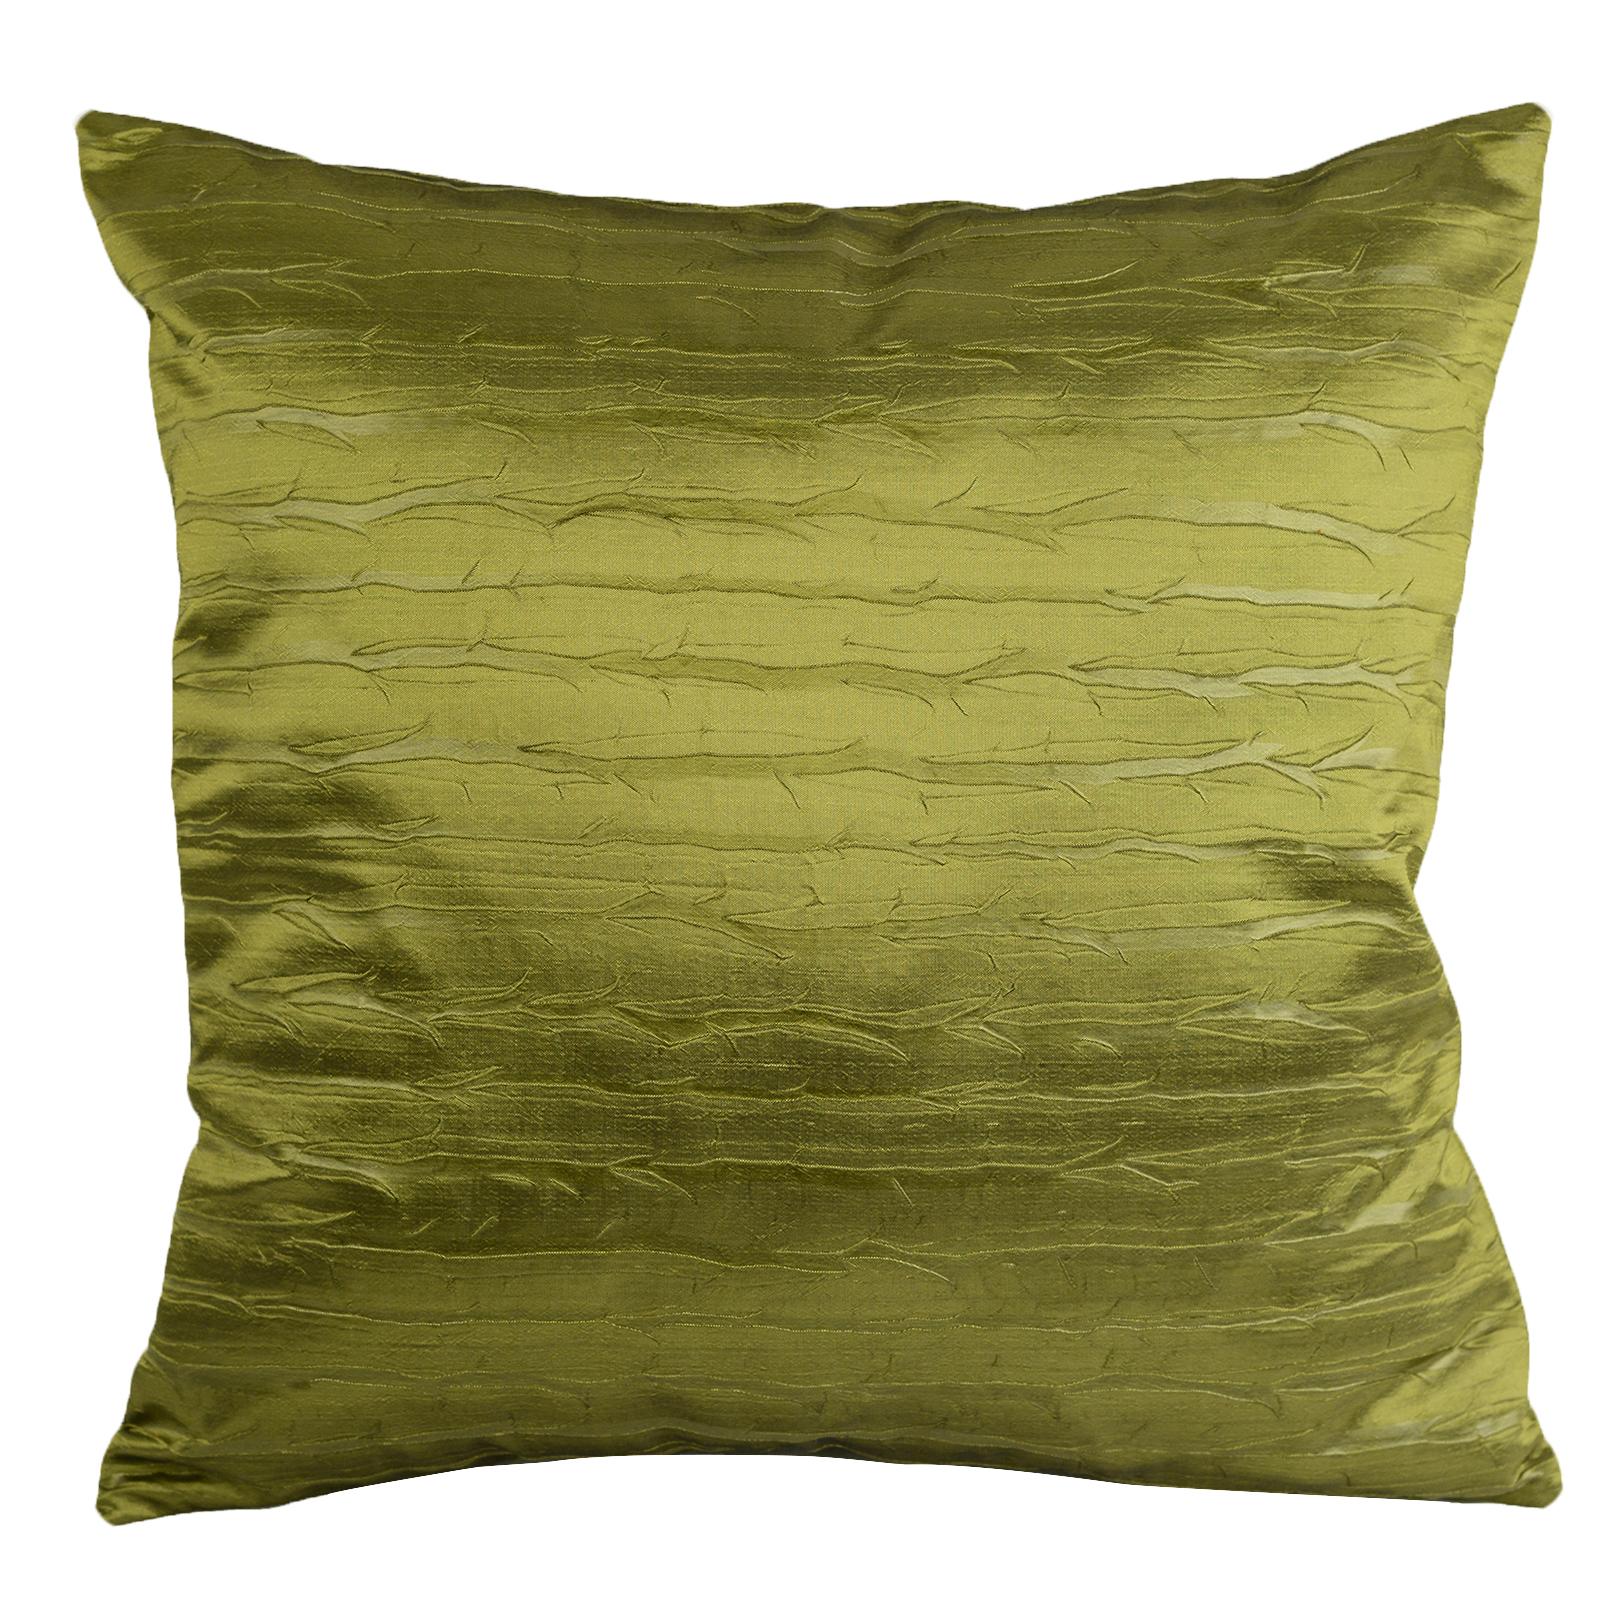 neu kissenh lle sofakissen kissenbezug kopfkissen kissen h lle bez ge 40x40 148 ebay. Black Bedroom Furniture Sets. Home Design Ideas